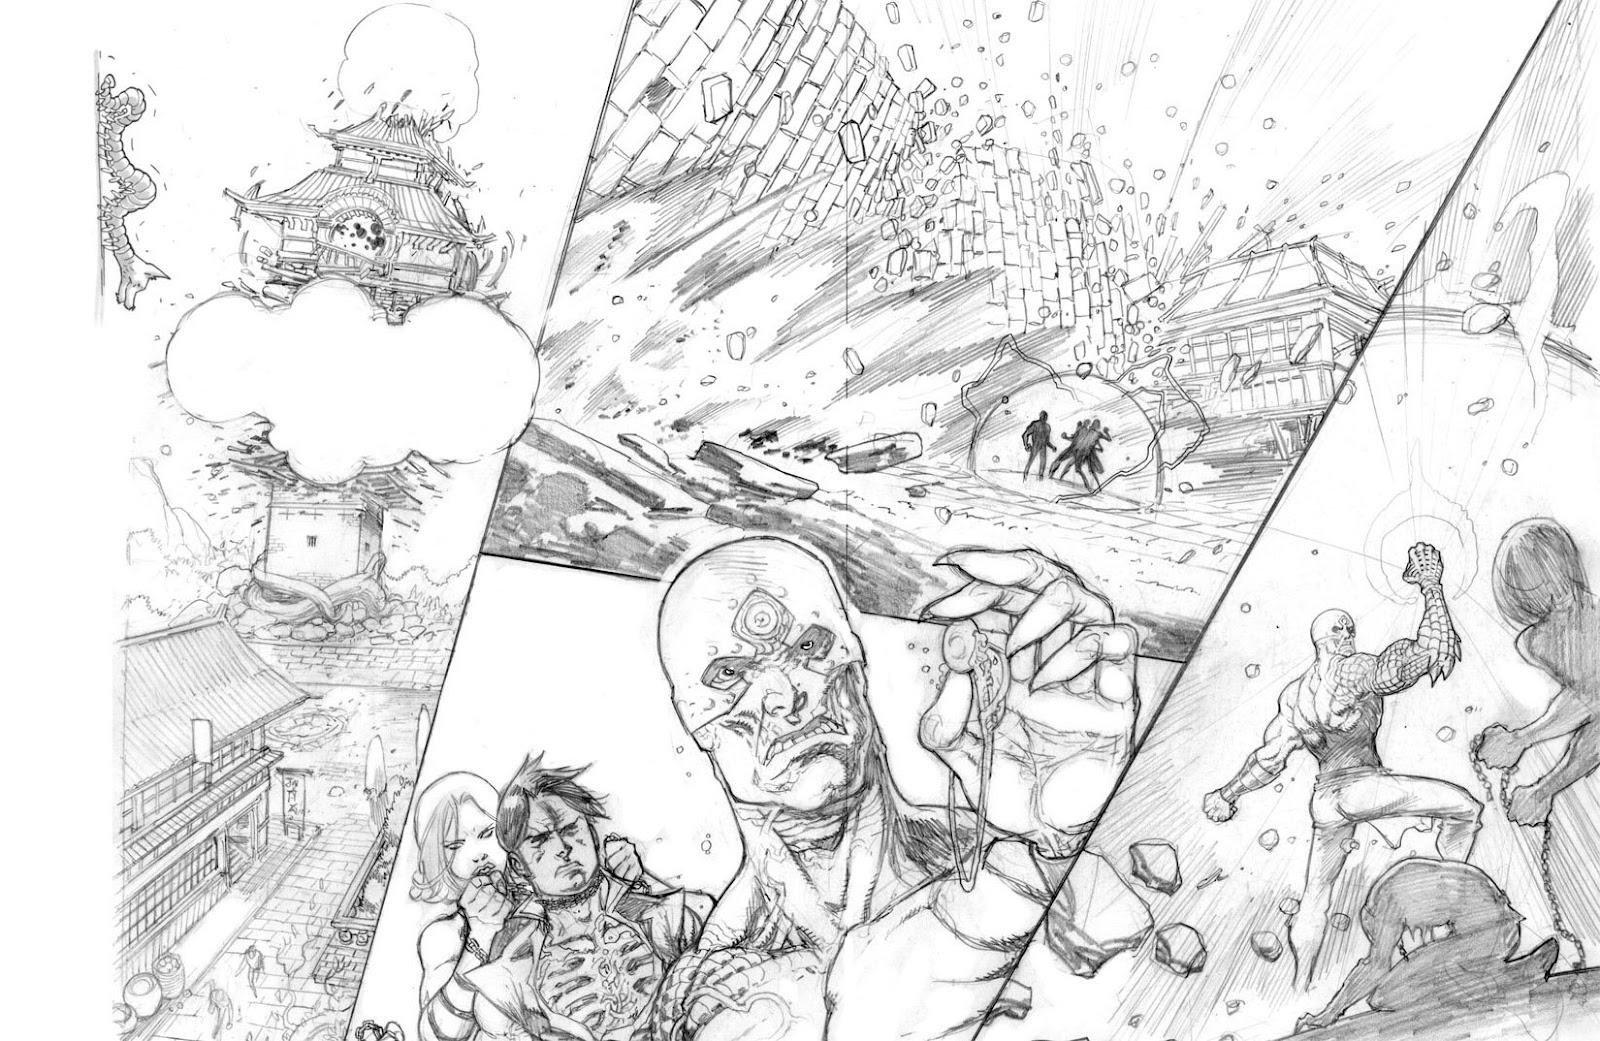 Read online Reaper comic -  Issue #2 - 45